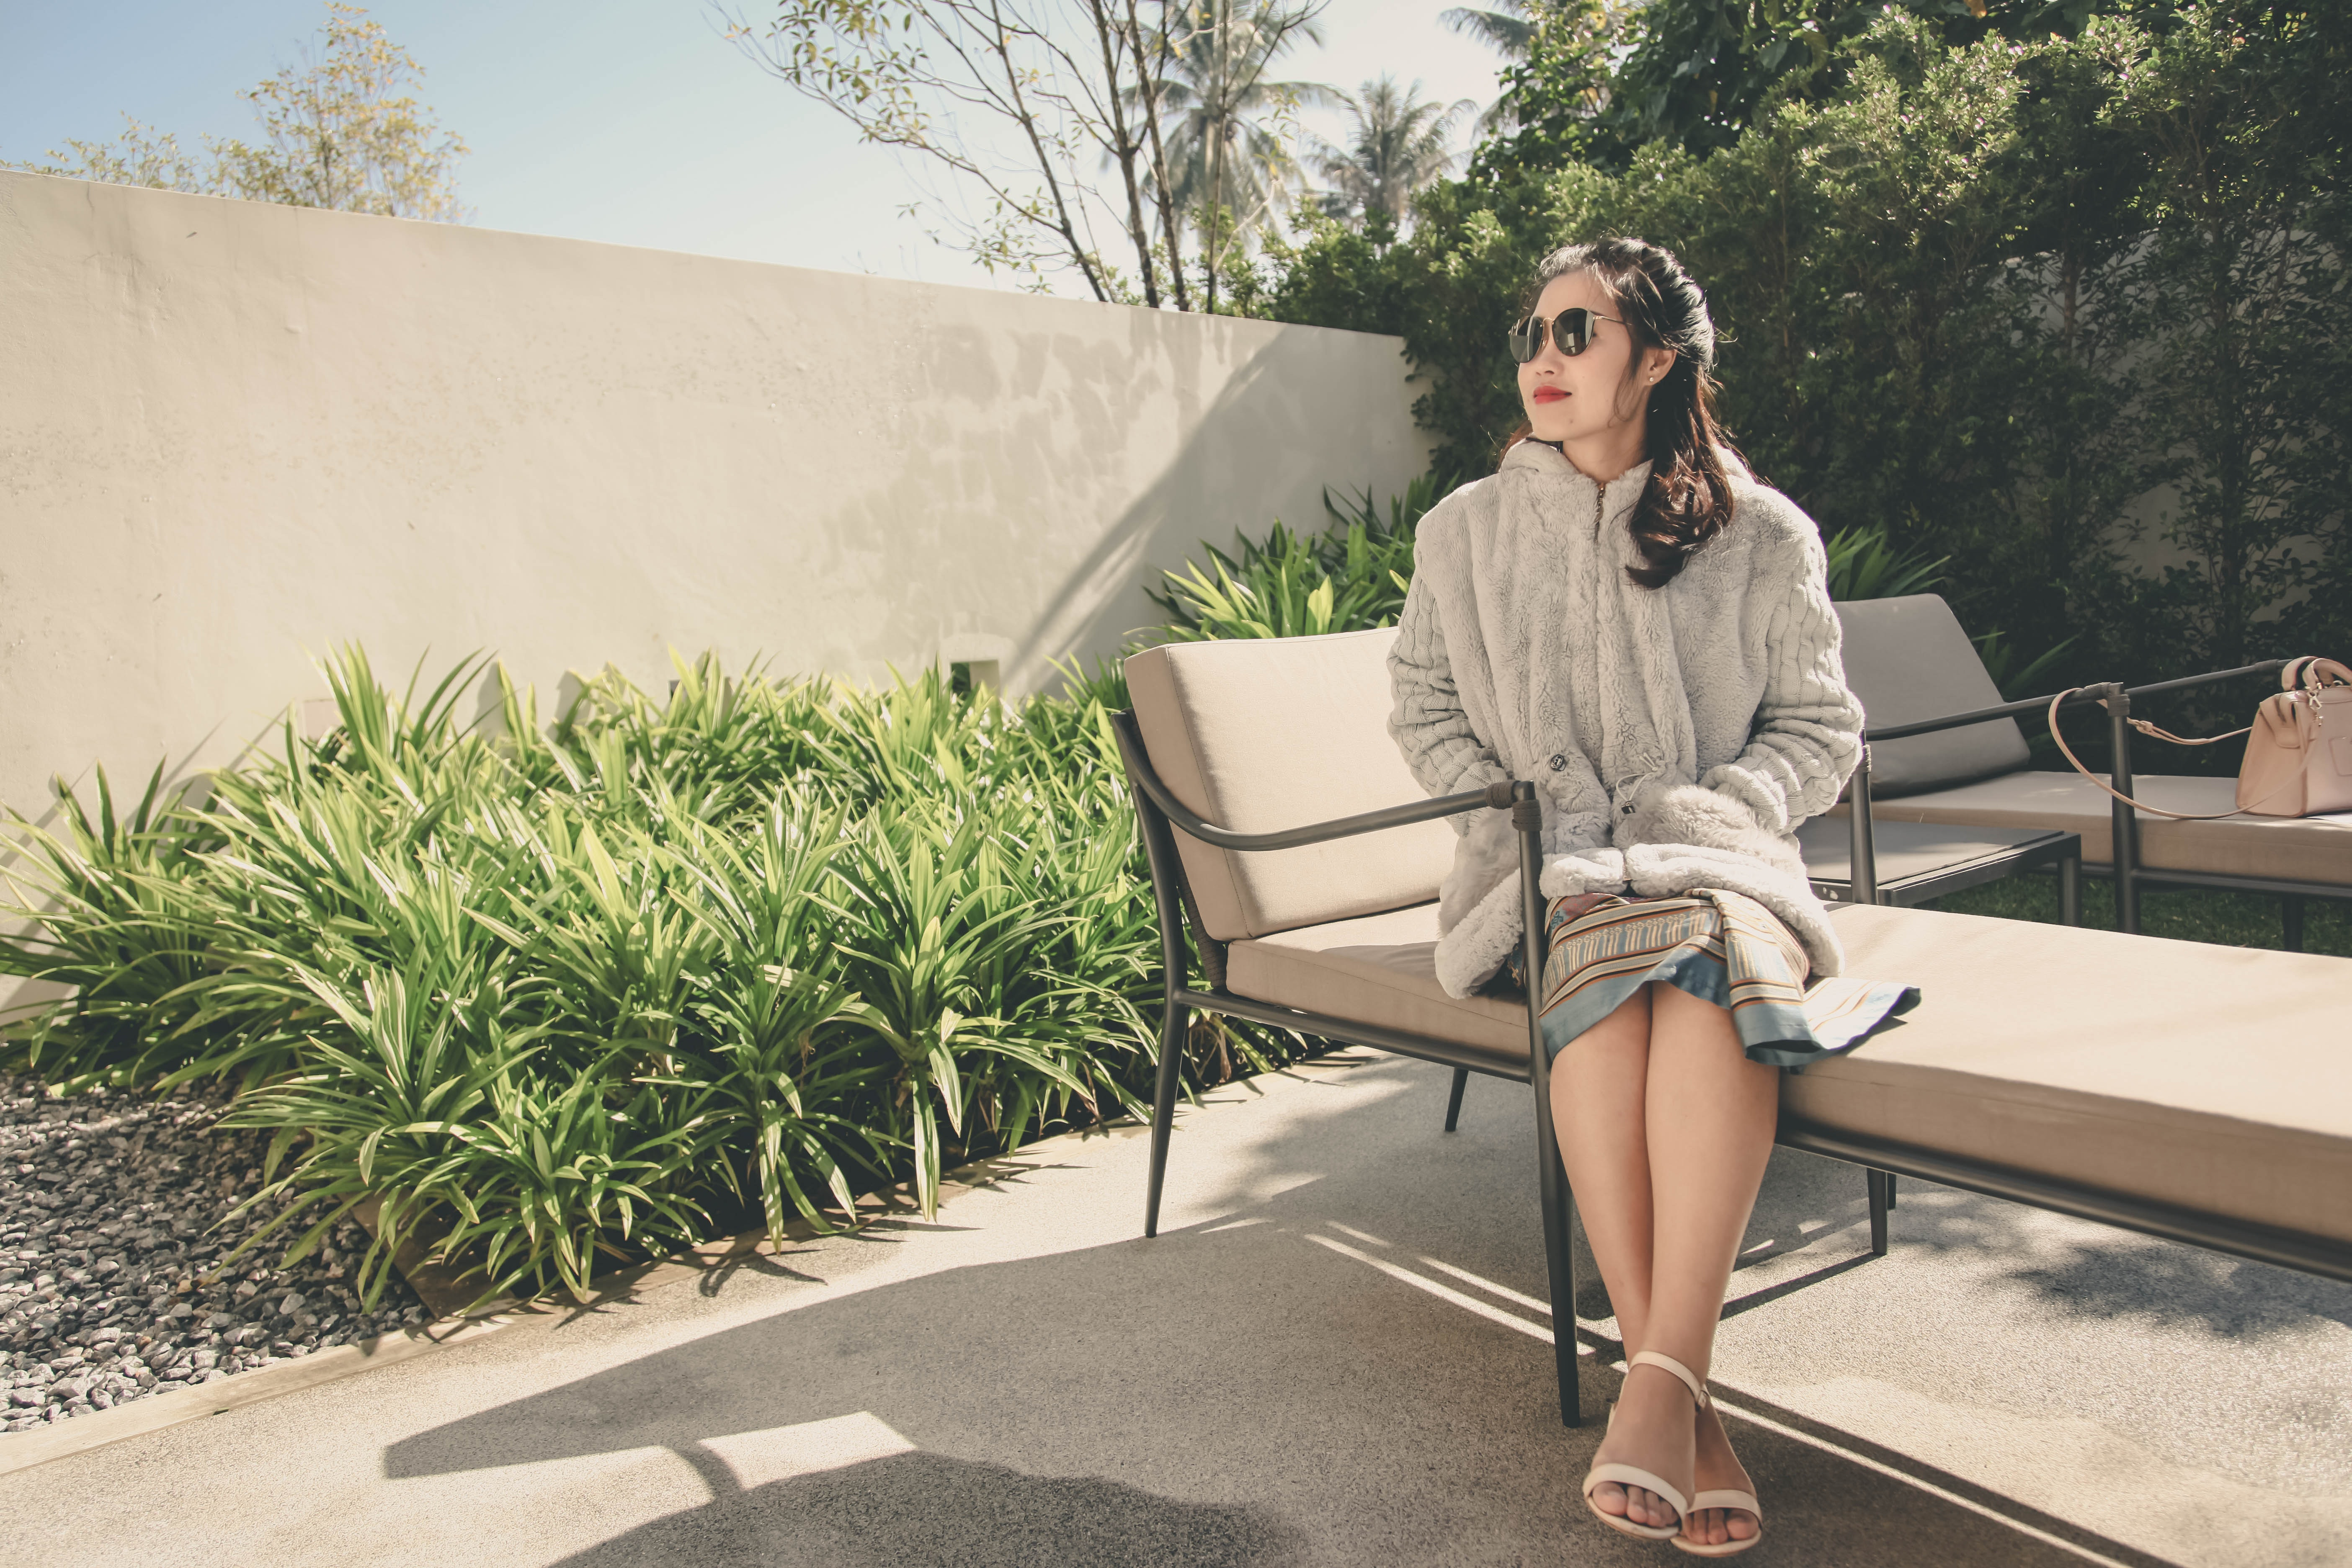 Woman Wearing Hoodie Sitting on Lounge Chair, Beautiful, Outdoors, Woman, Wear, HQ Photo